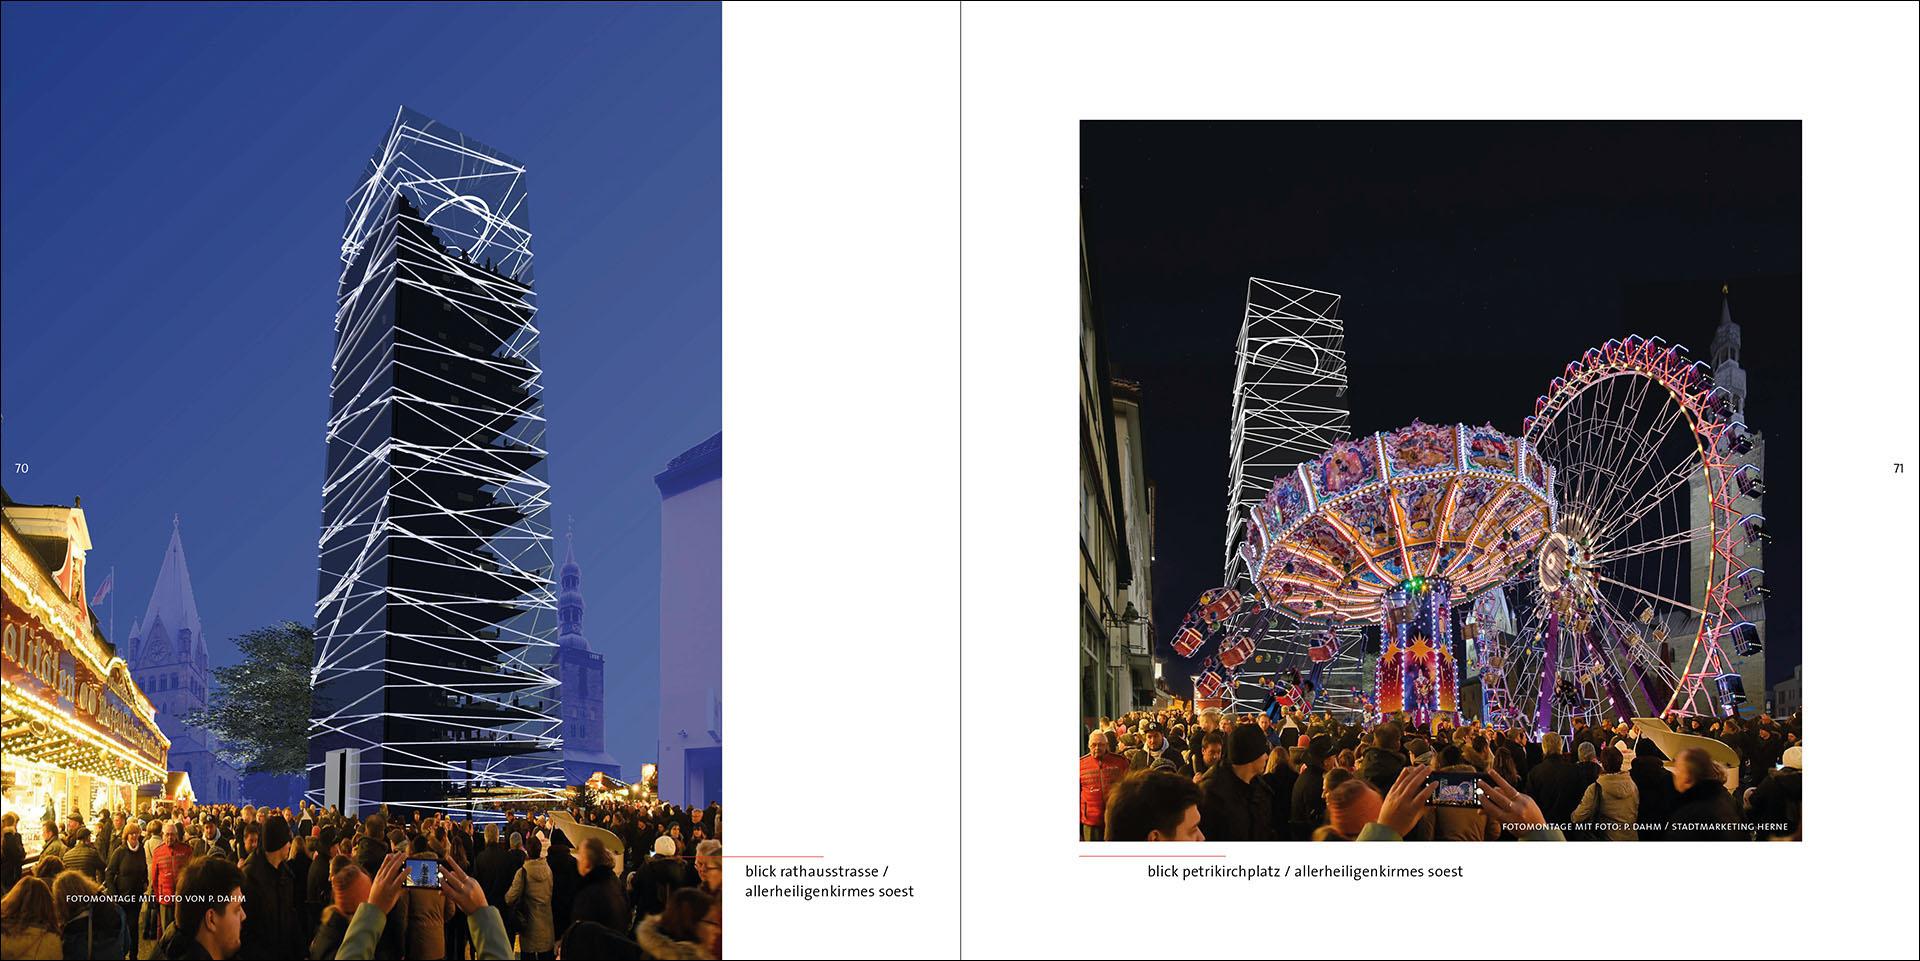 Architektur, Studie, Turm, Soest, Neu, Glas, Altstadt, Modern